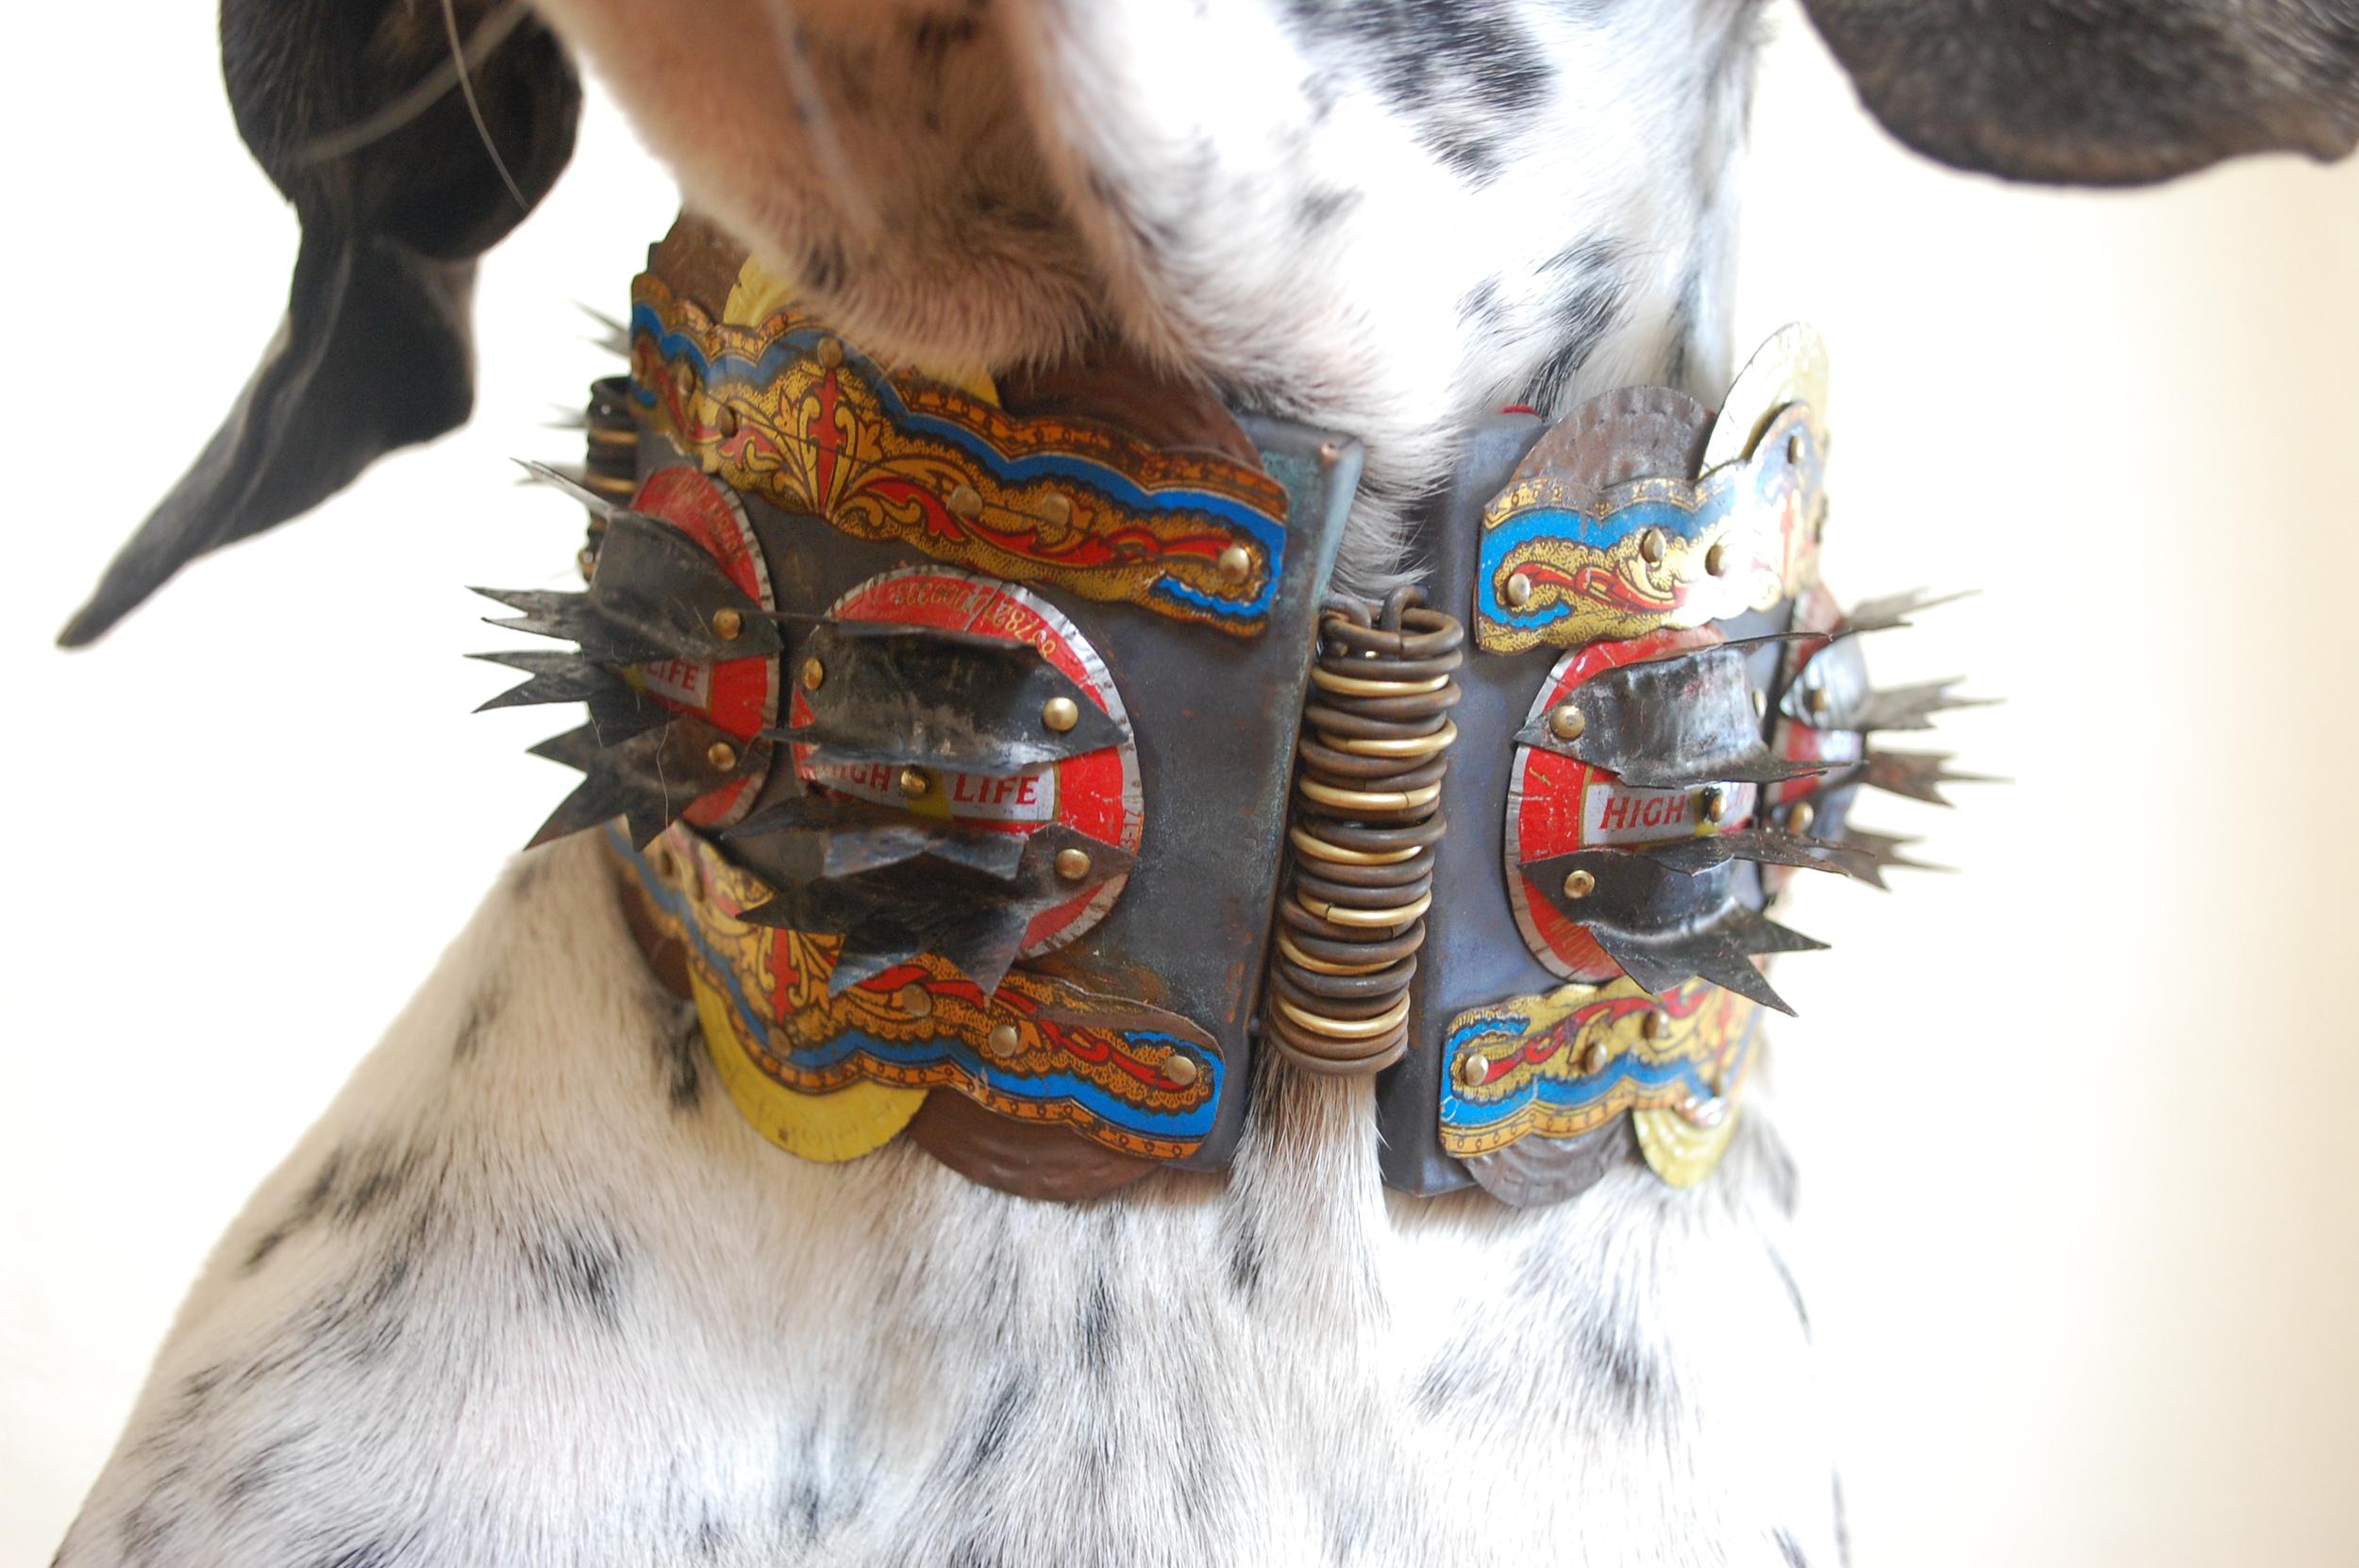 High Life Collar, 2012